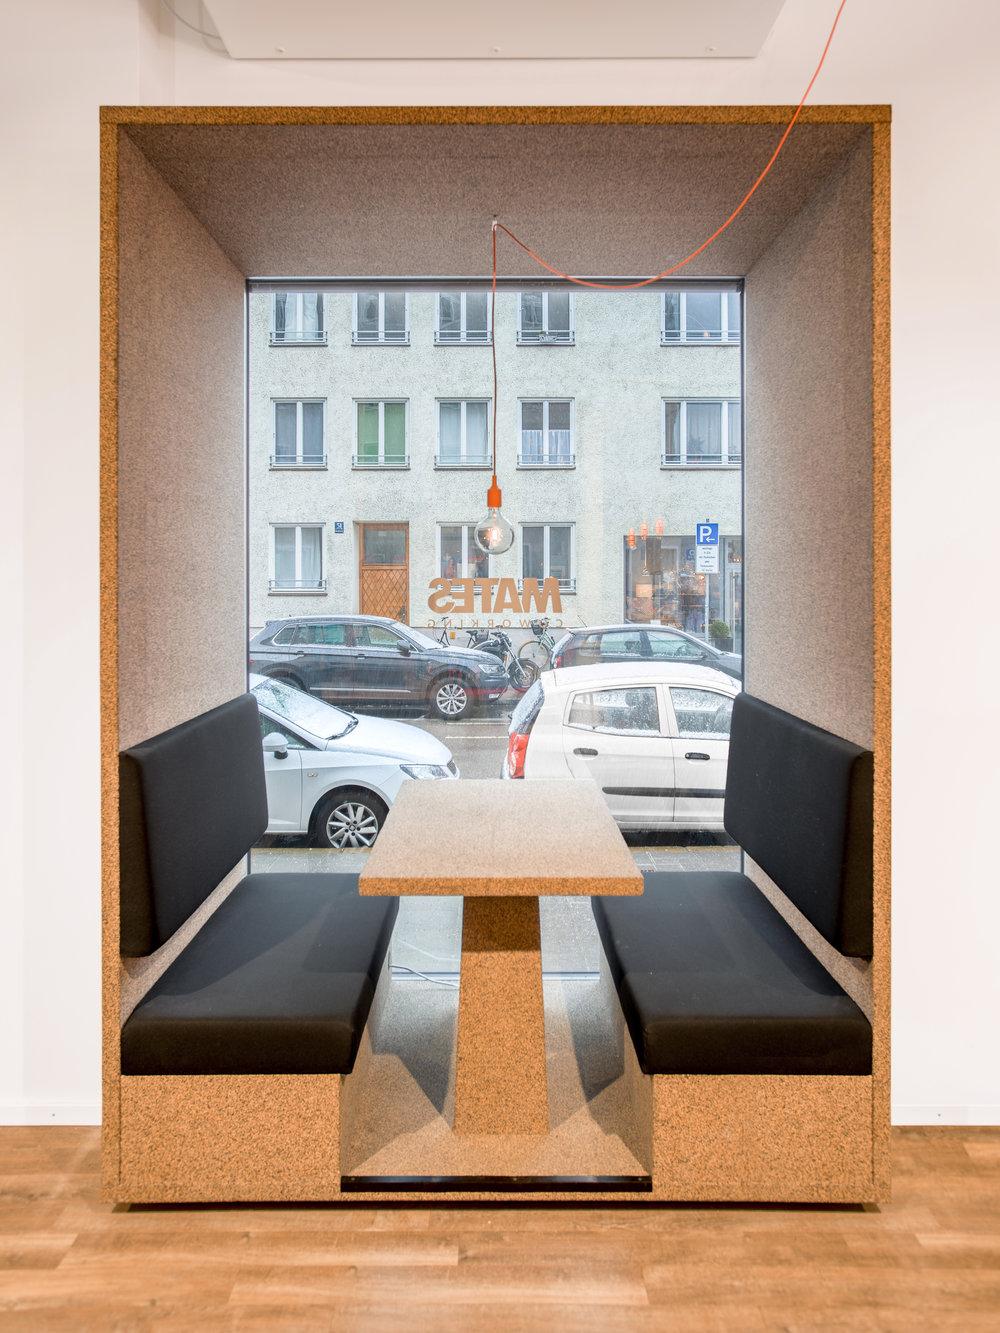 Mates Munich, Coworking, co-working space, communication, office, interior architecture, design, pendant light, muuto